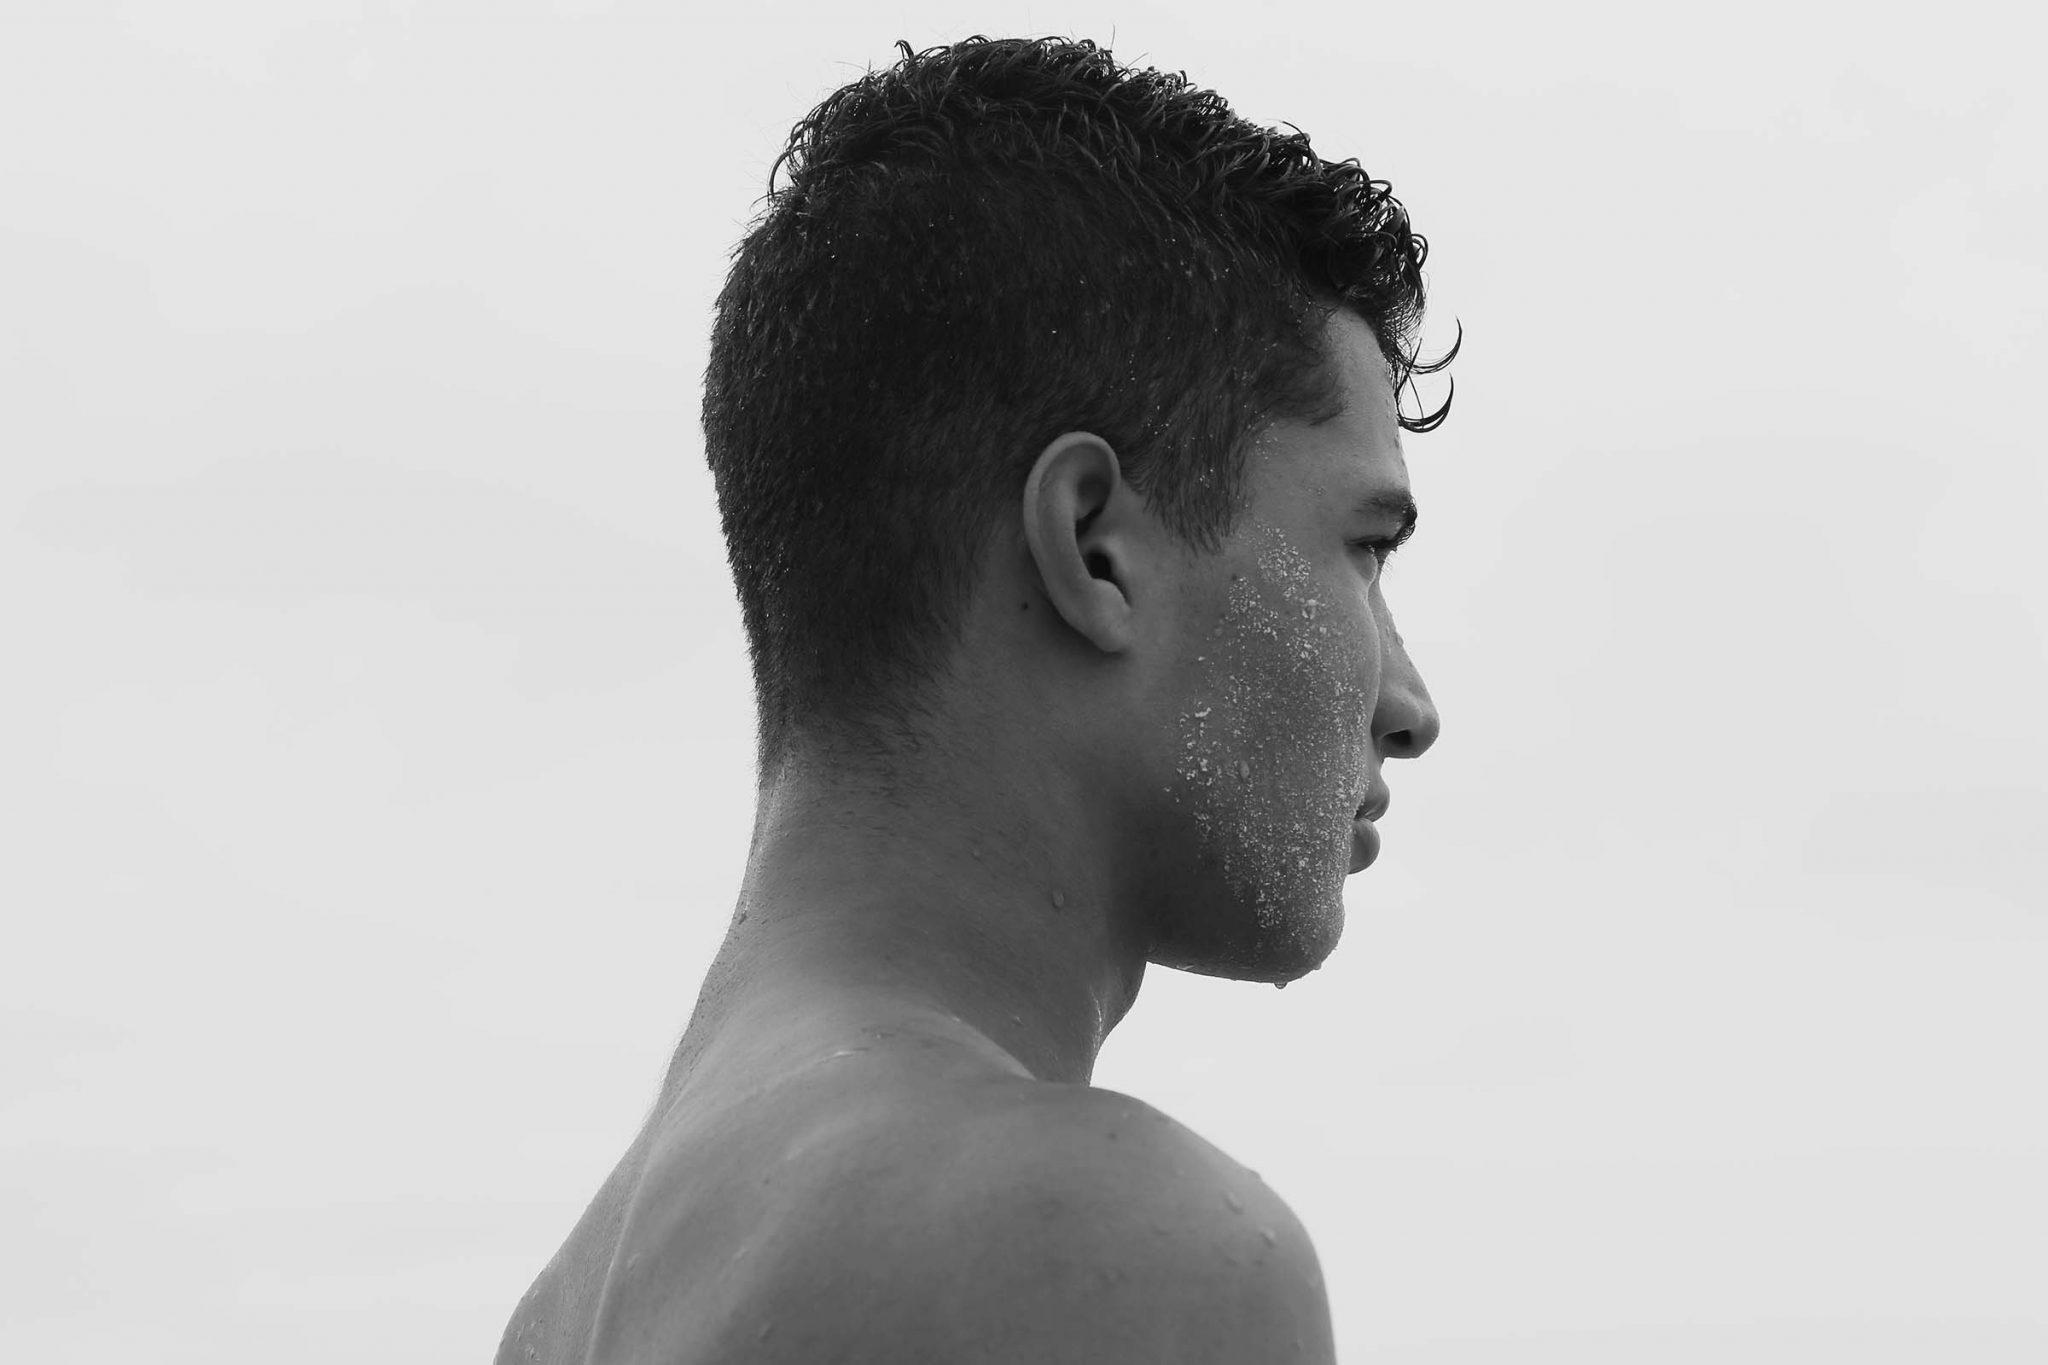 Emanuel Ramos by Moises Almeida for Brazilian Male Model